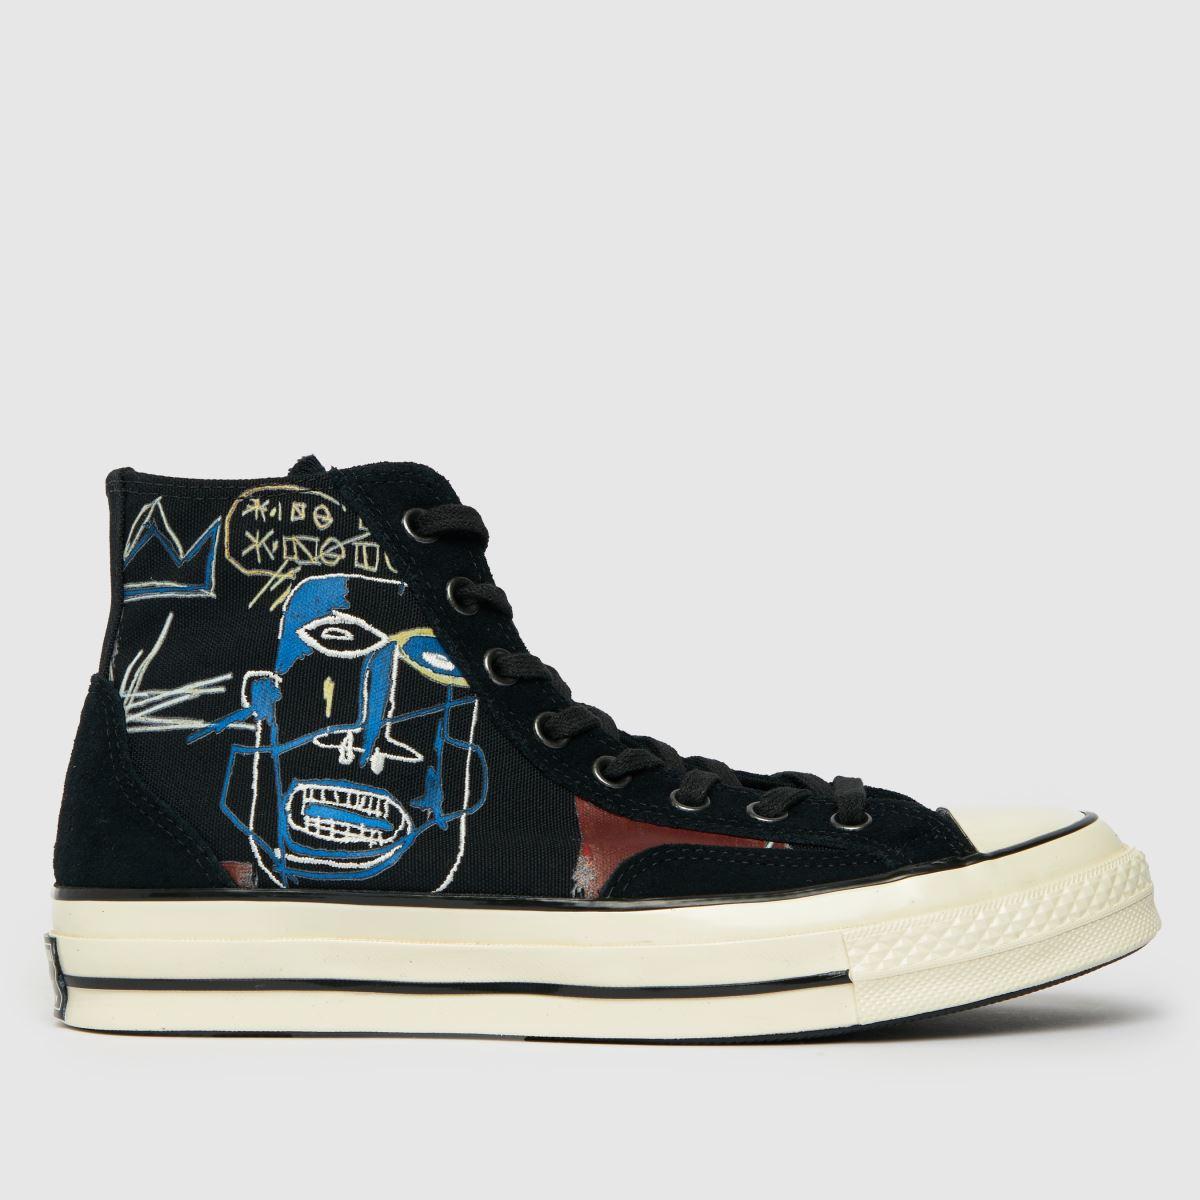 Converse Black & Brown Basquiat Chuck 70 Hi Trainers